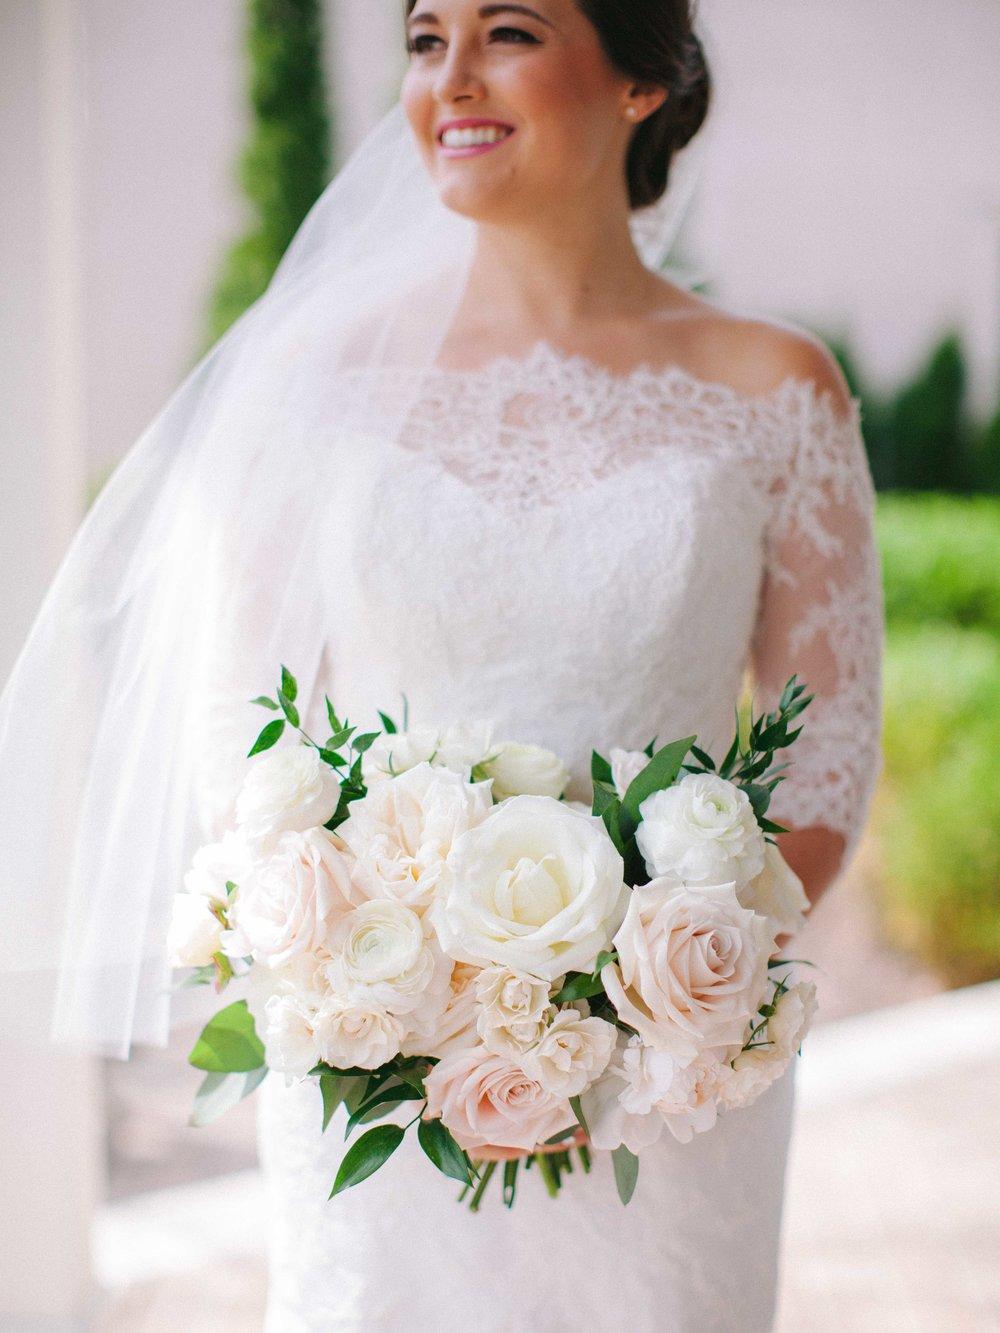 Niagara_on_the_lake_spring_wedding_kurtz_orpia_toronto_Vineyard_wedding_fine_art (22 of 92).jpg